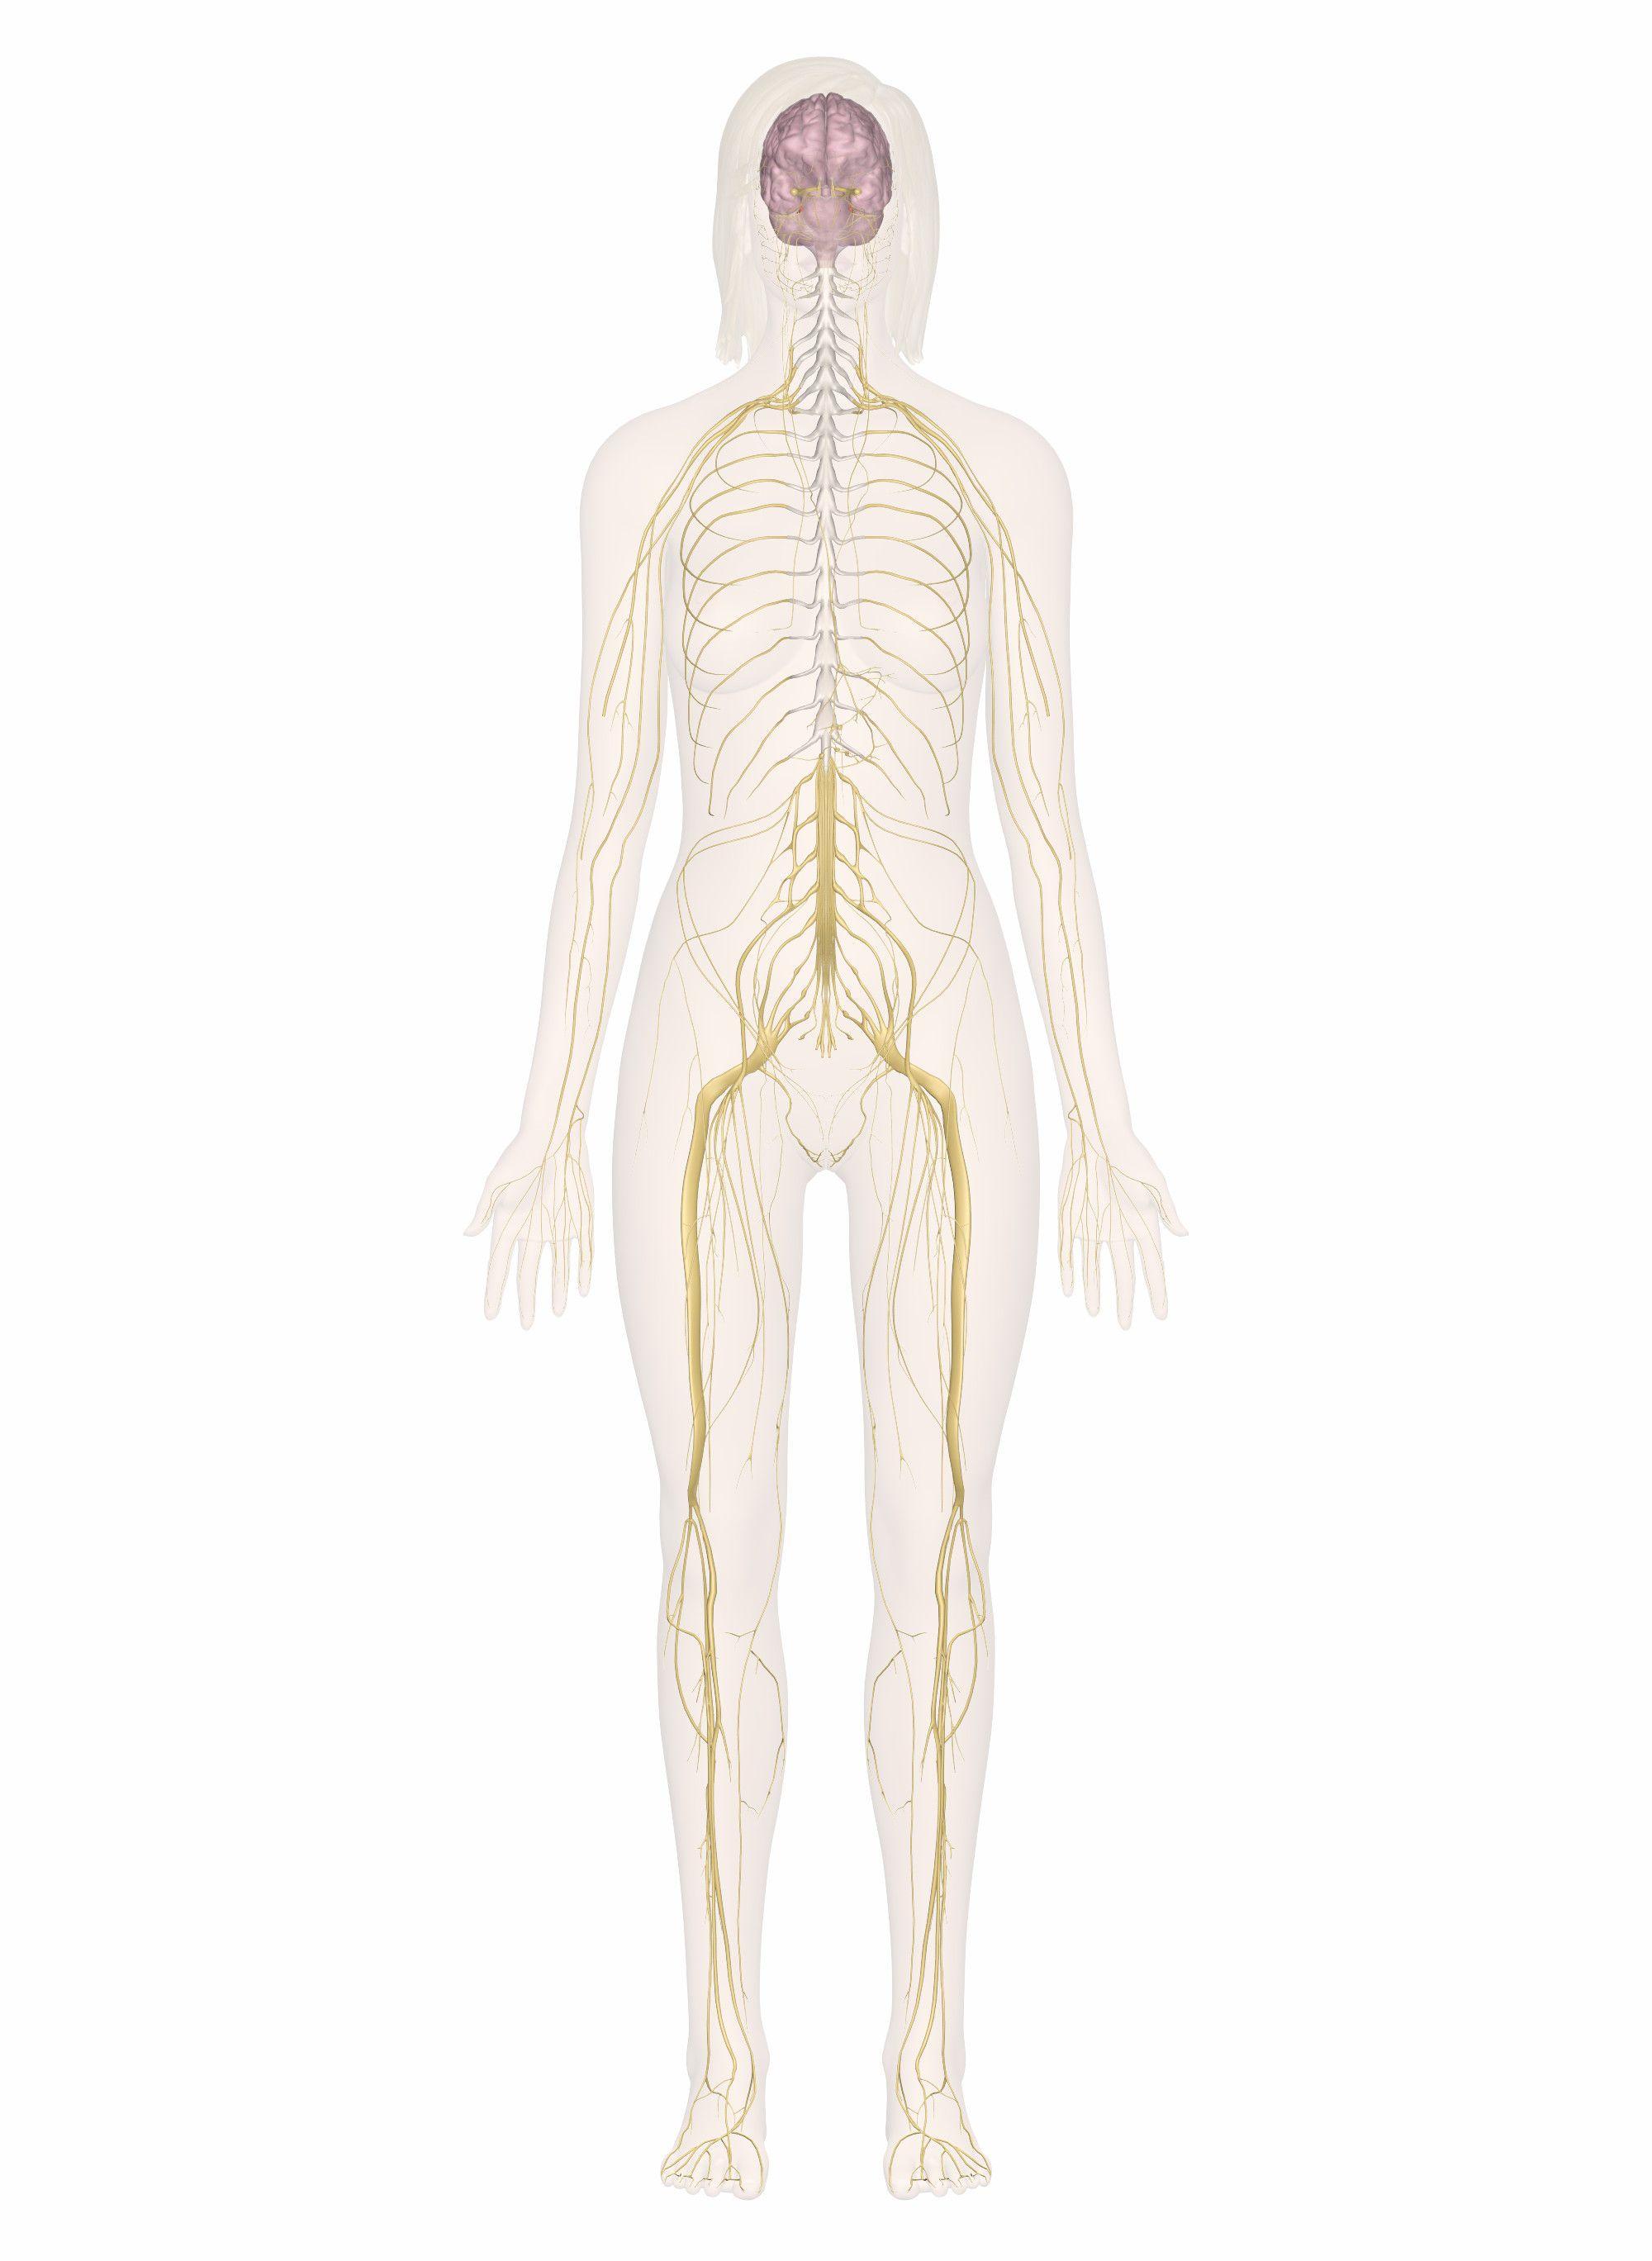 New Nervous System Worksheet Answer Key